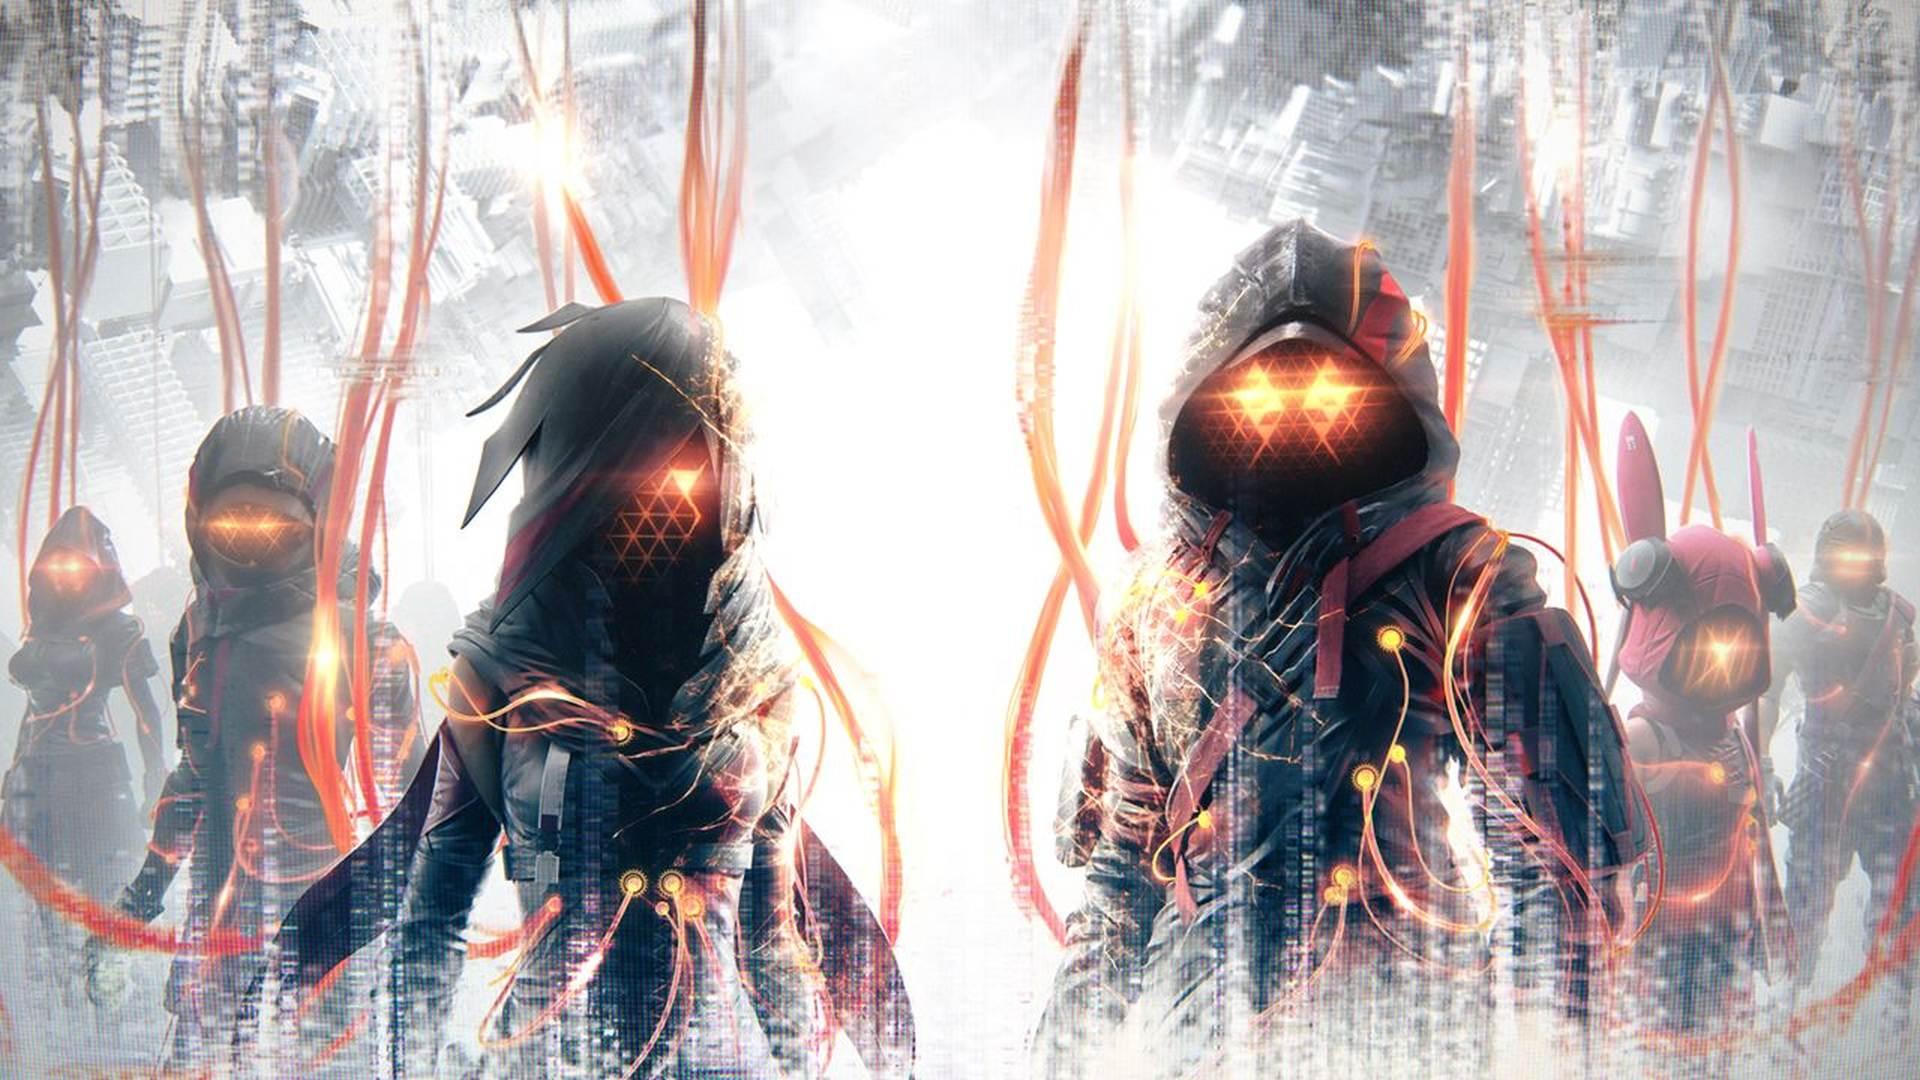 Scarlet Nexus' brain-powers are on full display in two new gameplay trailers screenshot